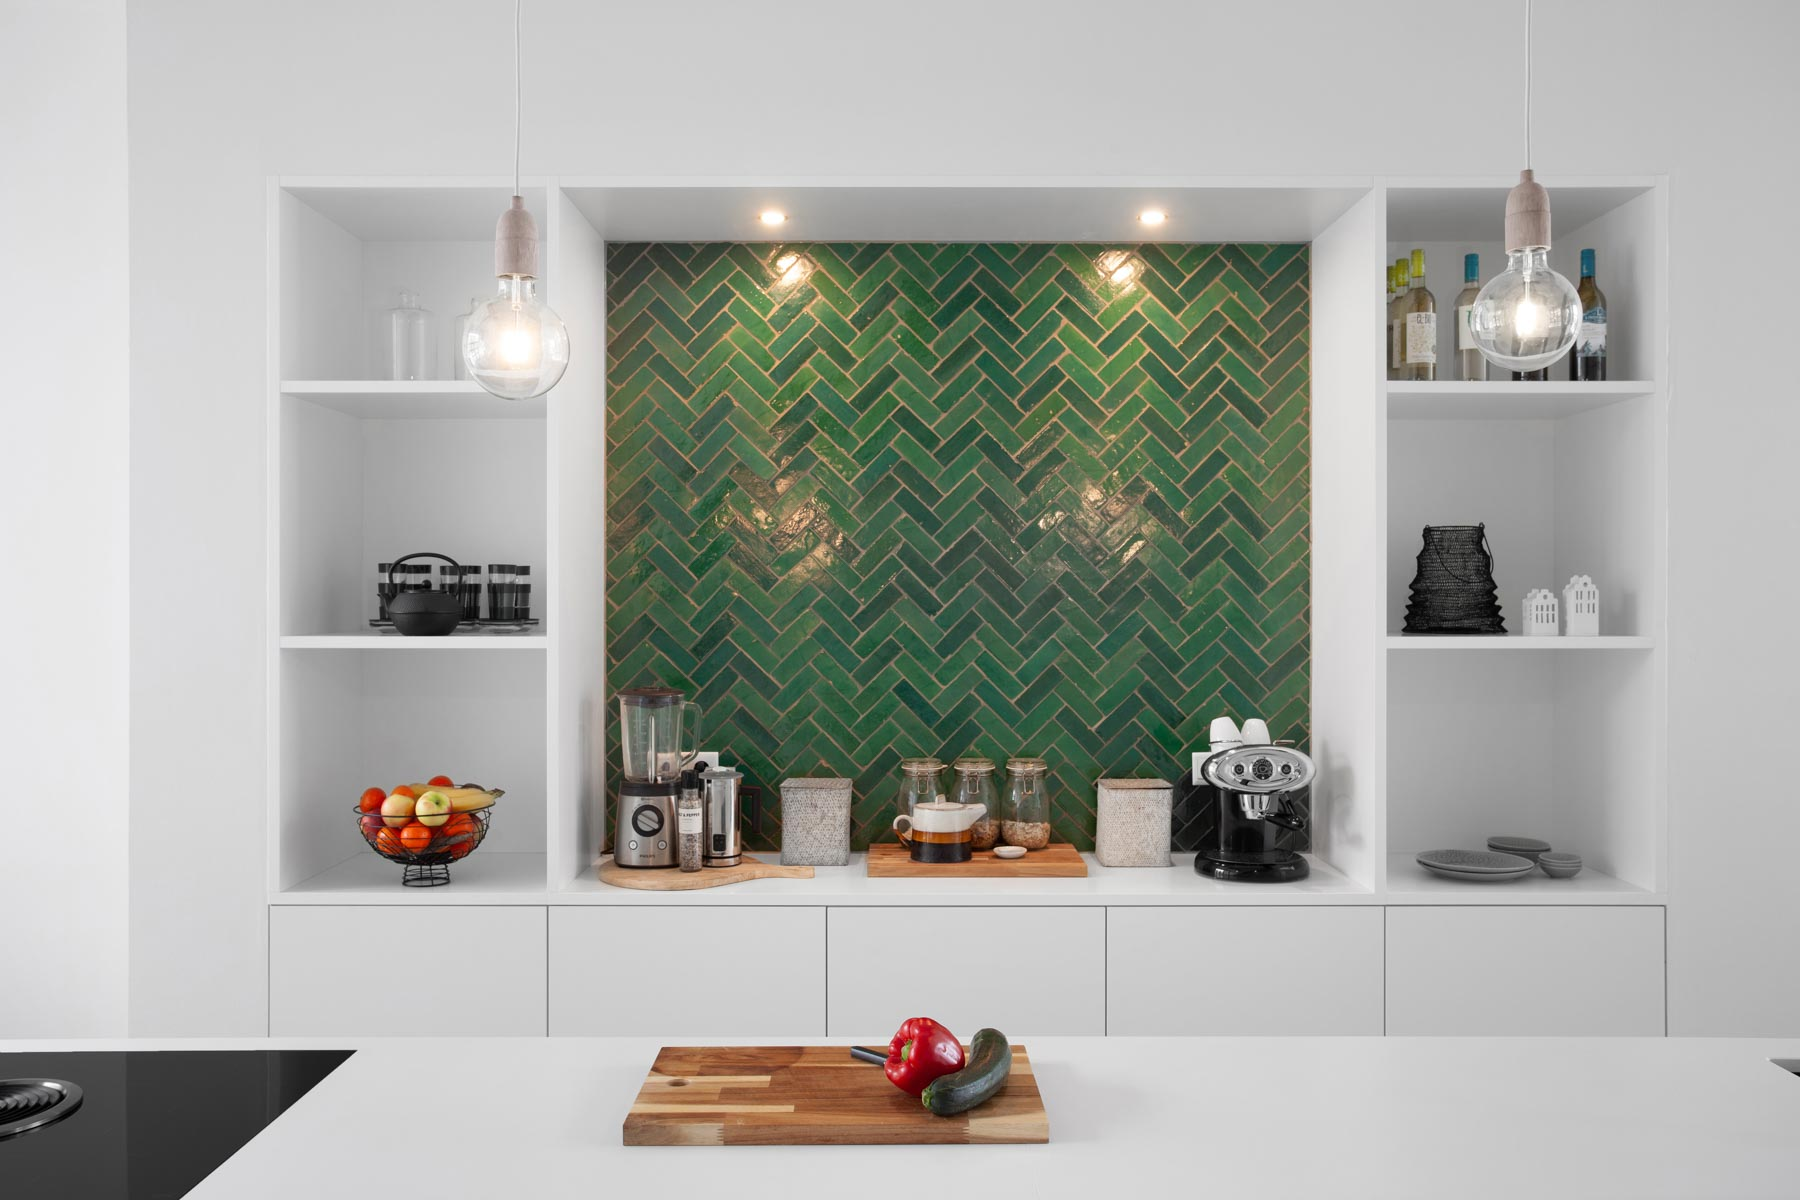 Designtegels keuken. Witte keuken met Marokkaanse tegels Zellige Vert Foncee 02 #keuken #keukentegels #designtegels #marokkaans #tegels #zellige